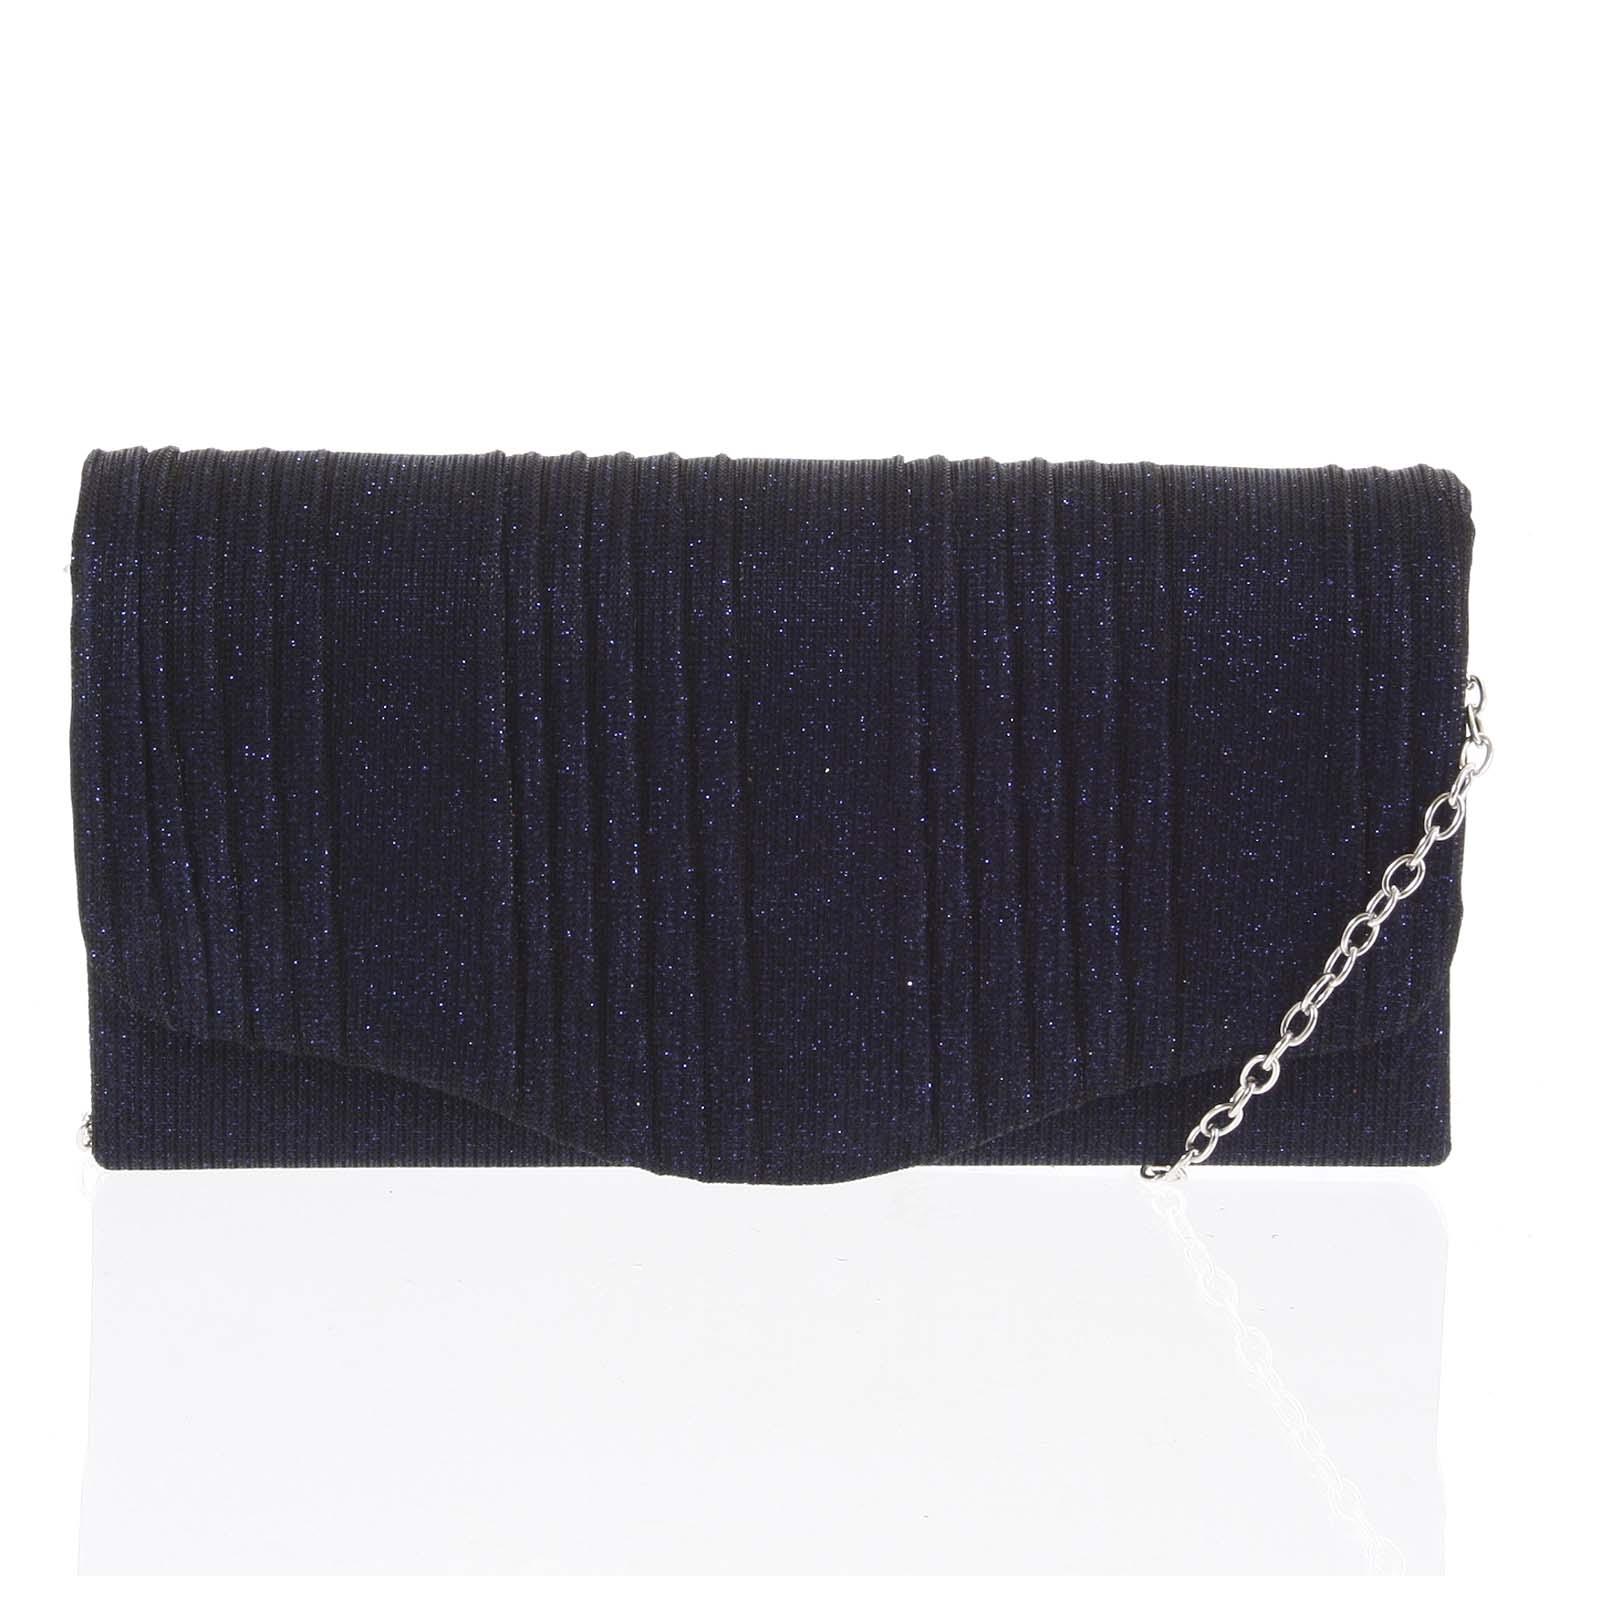 Dámska listová kabelka tmavo modrá - Michelle Moon Master